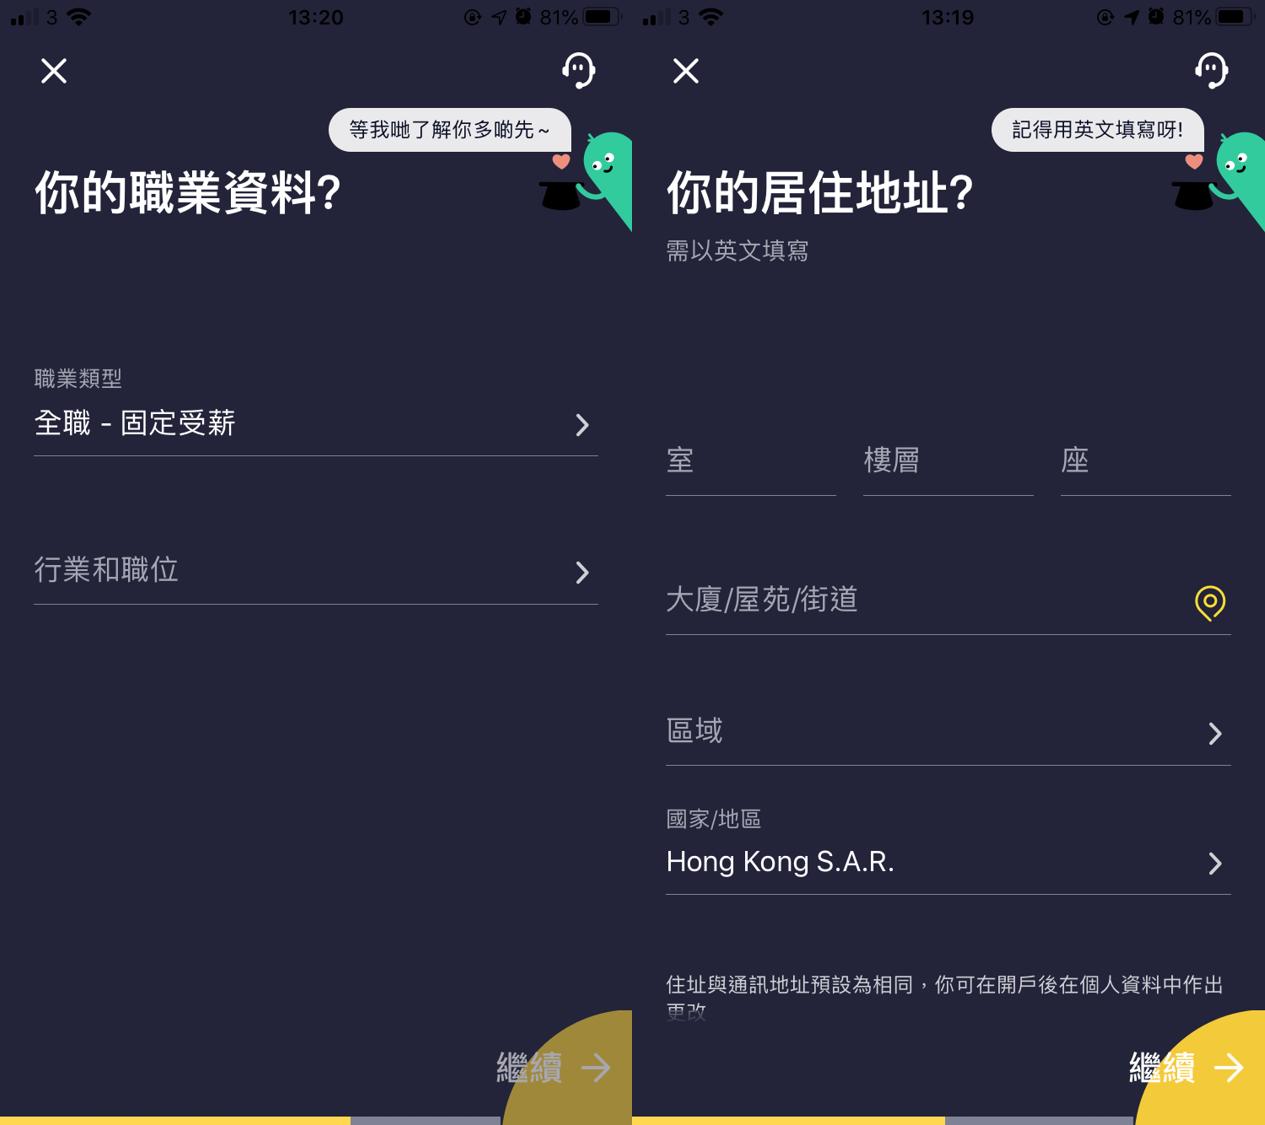 ZA Bank 額外HK$100邀請碼:「V42646」!全港第一虛擬銀行!!用 ZA Card 購物高達200%回贈!活期息都有1%p.a. 呀!插图7